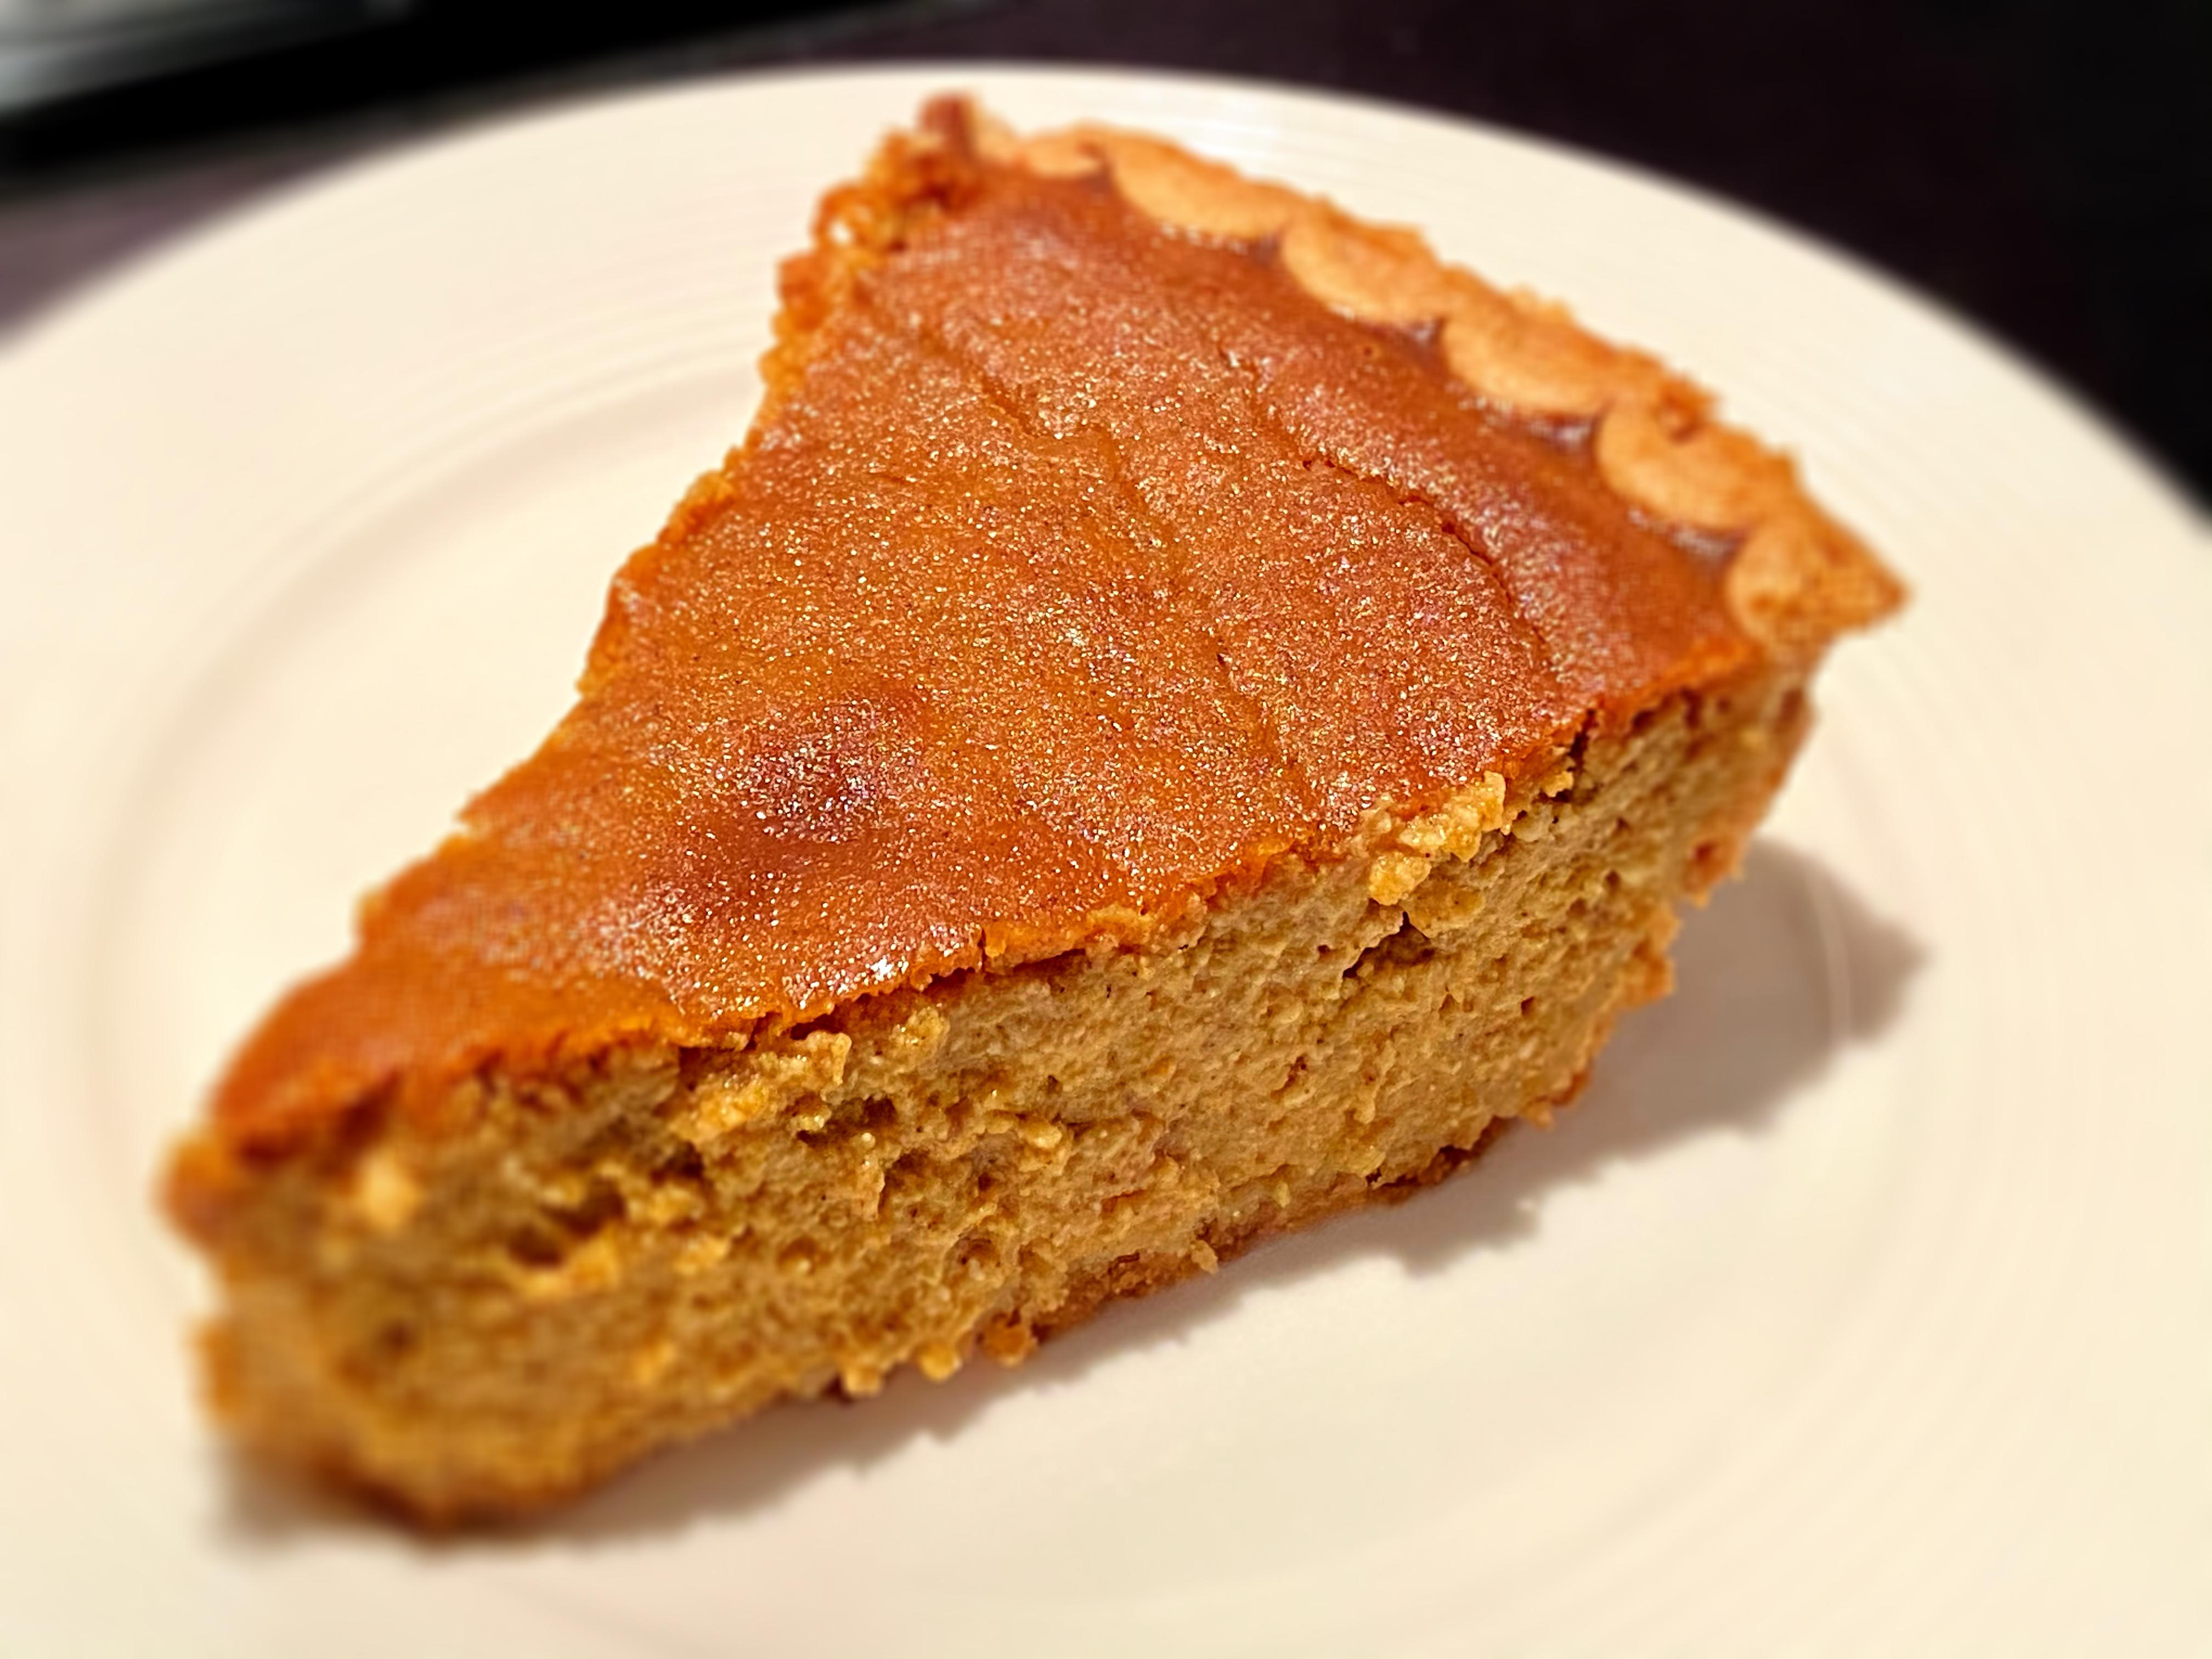 Creamy Pumpkin Pie with Ricotta Cheese 3Sorahs